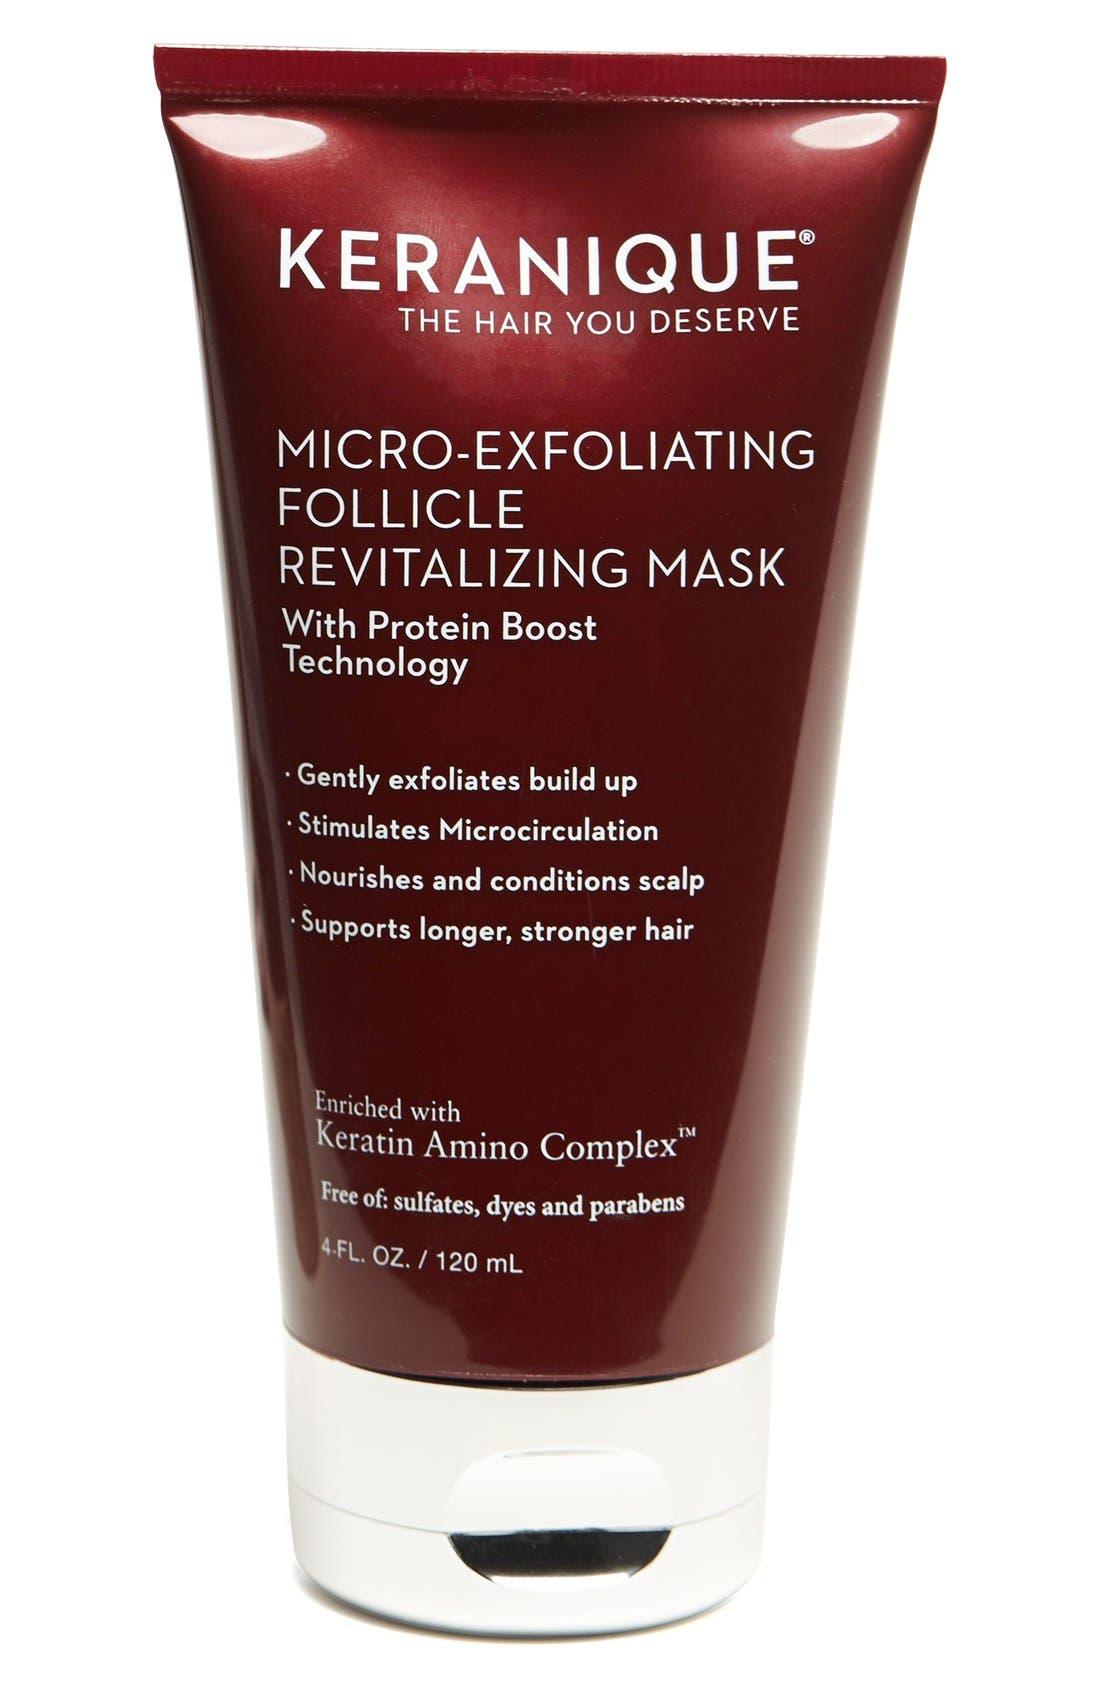 Micro-Exfoliating Follicle Mask,                             Alternate thumbnail 2, color,                             NO COLOR